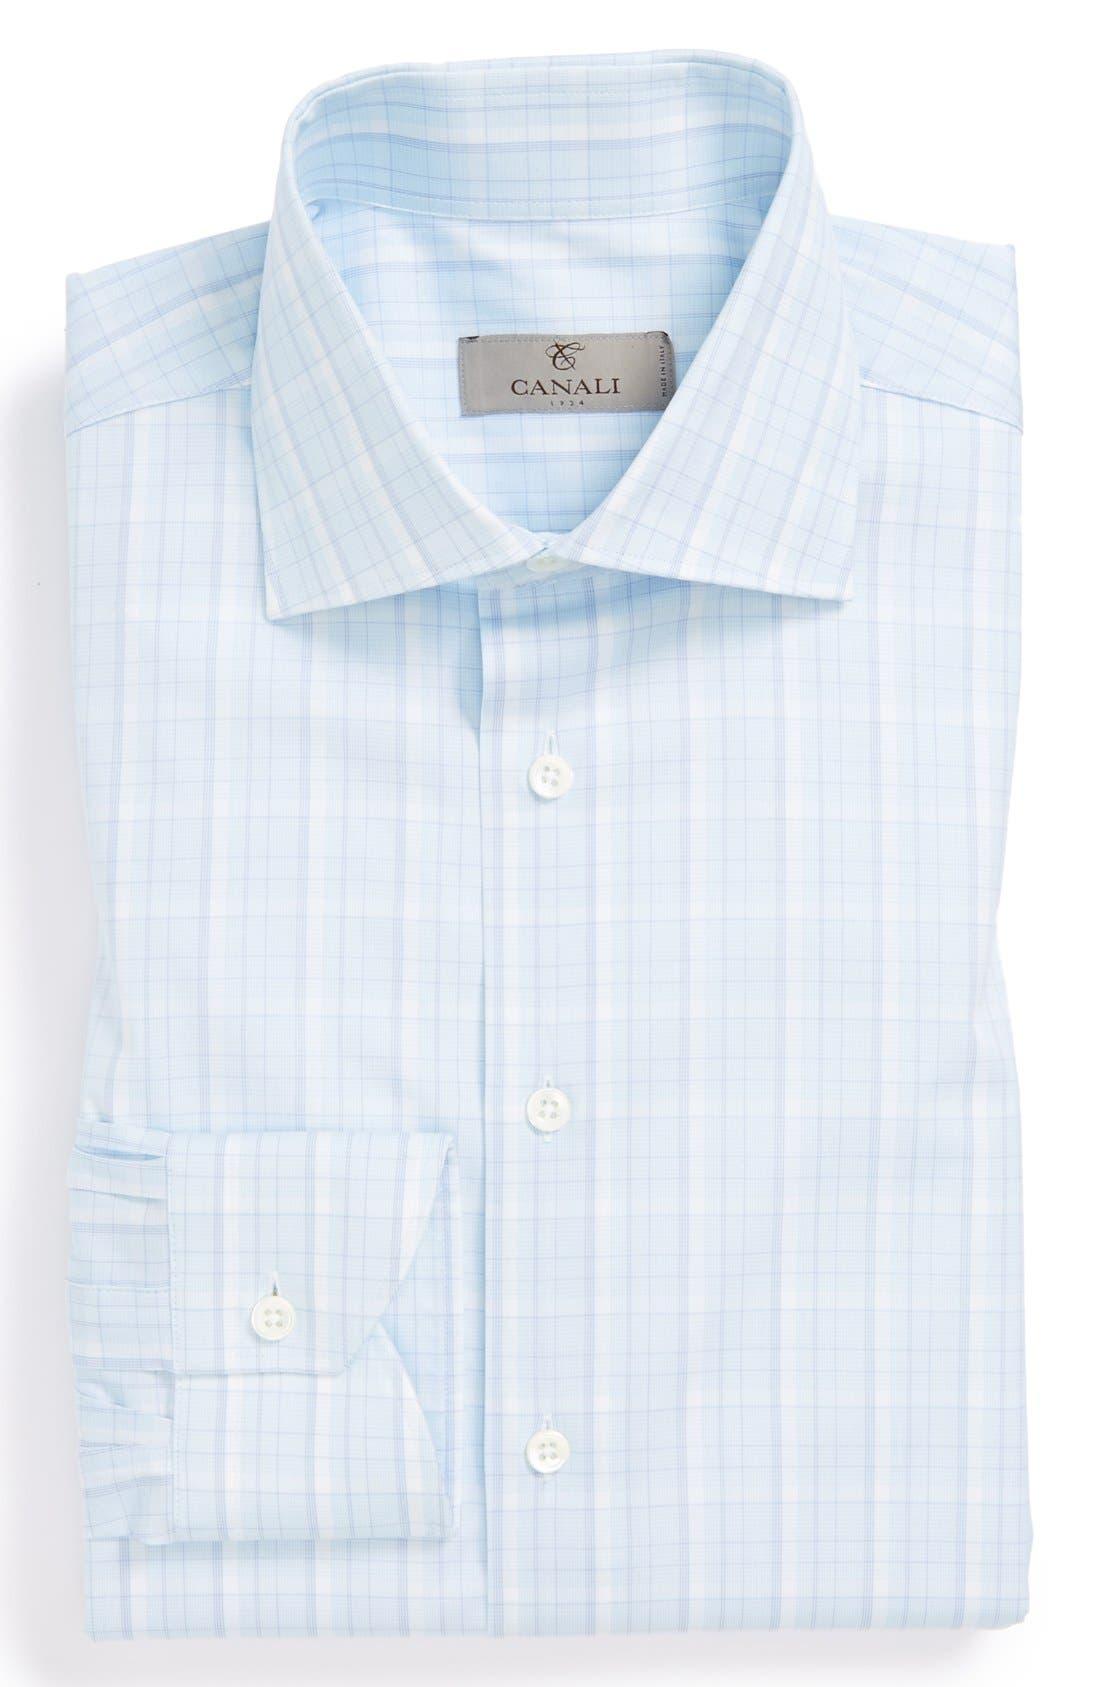 Alternate Image 1 Selected - Canali Poplin Graph Check Regular Fit Dress Shirt